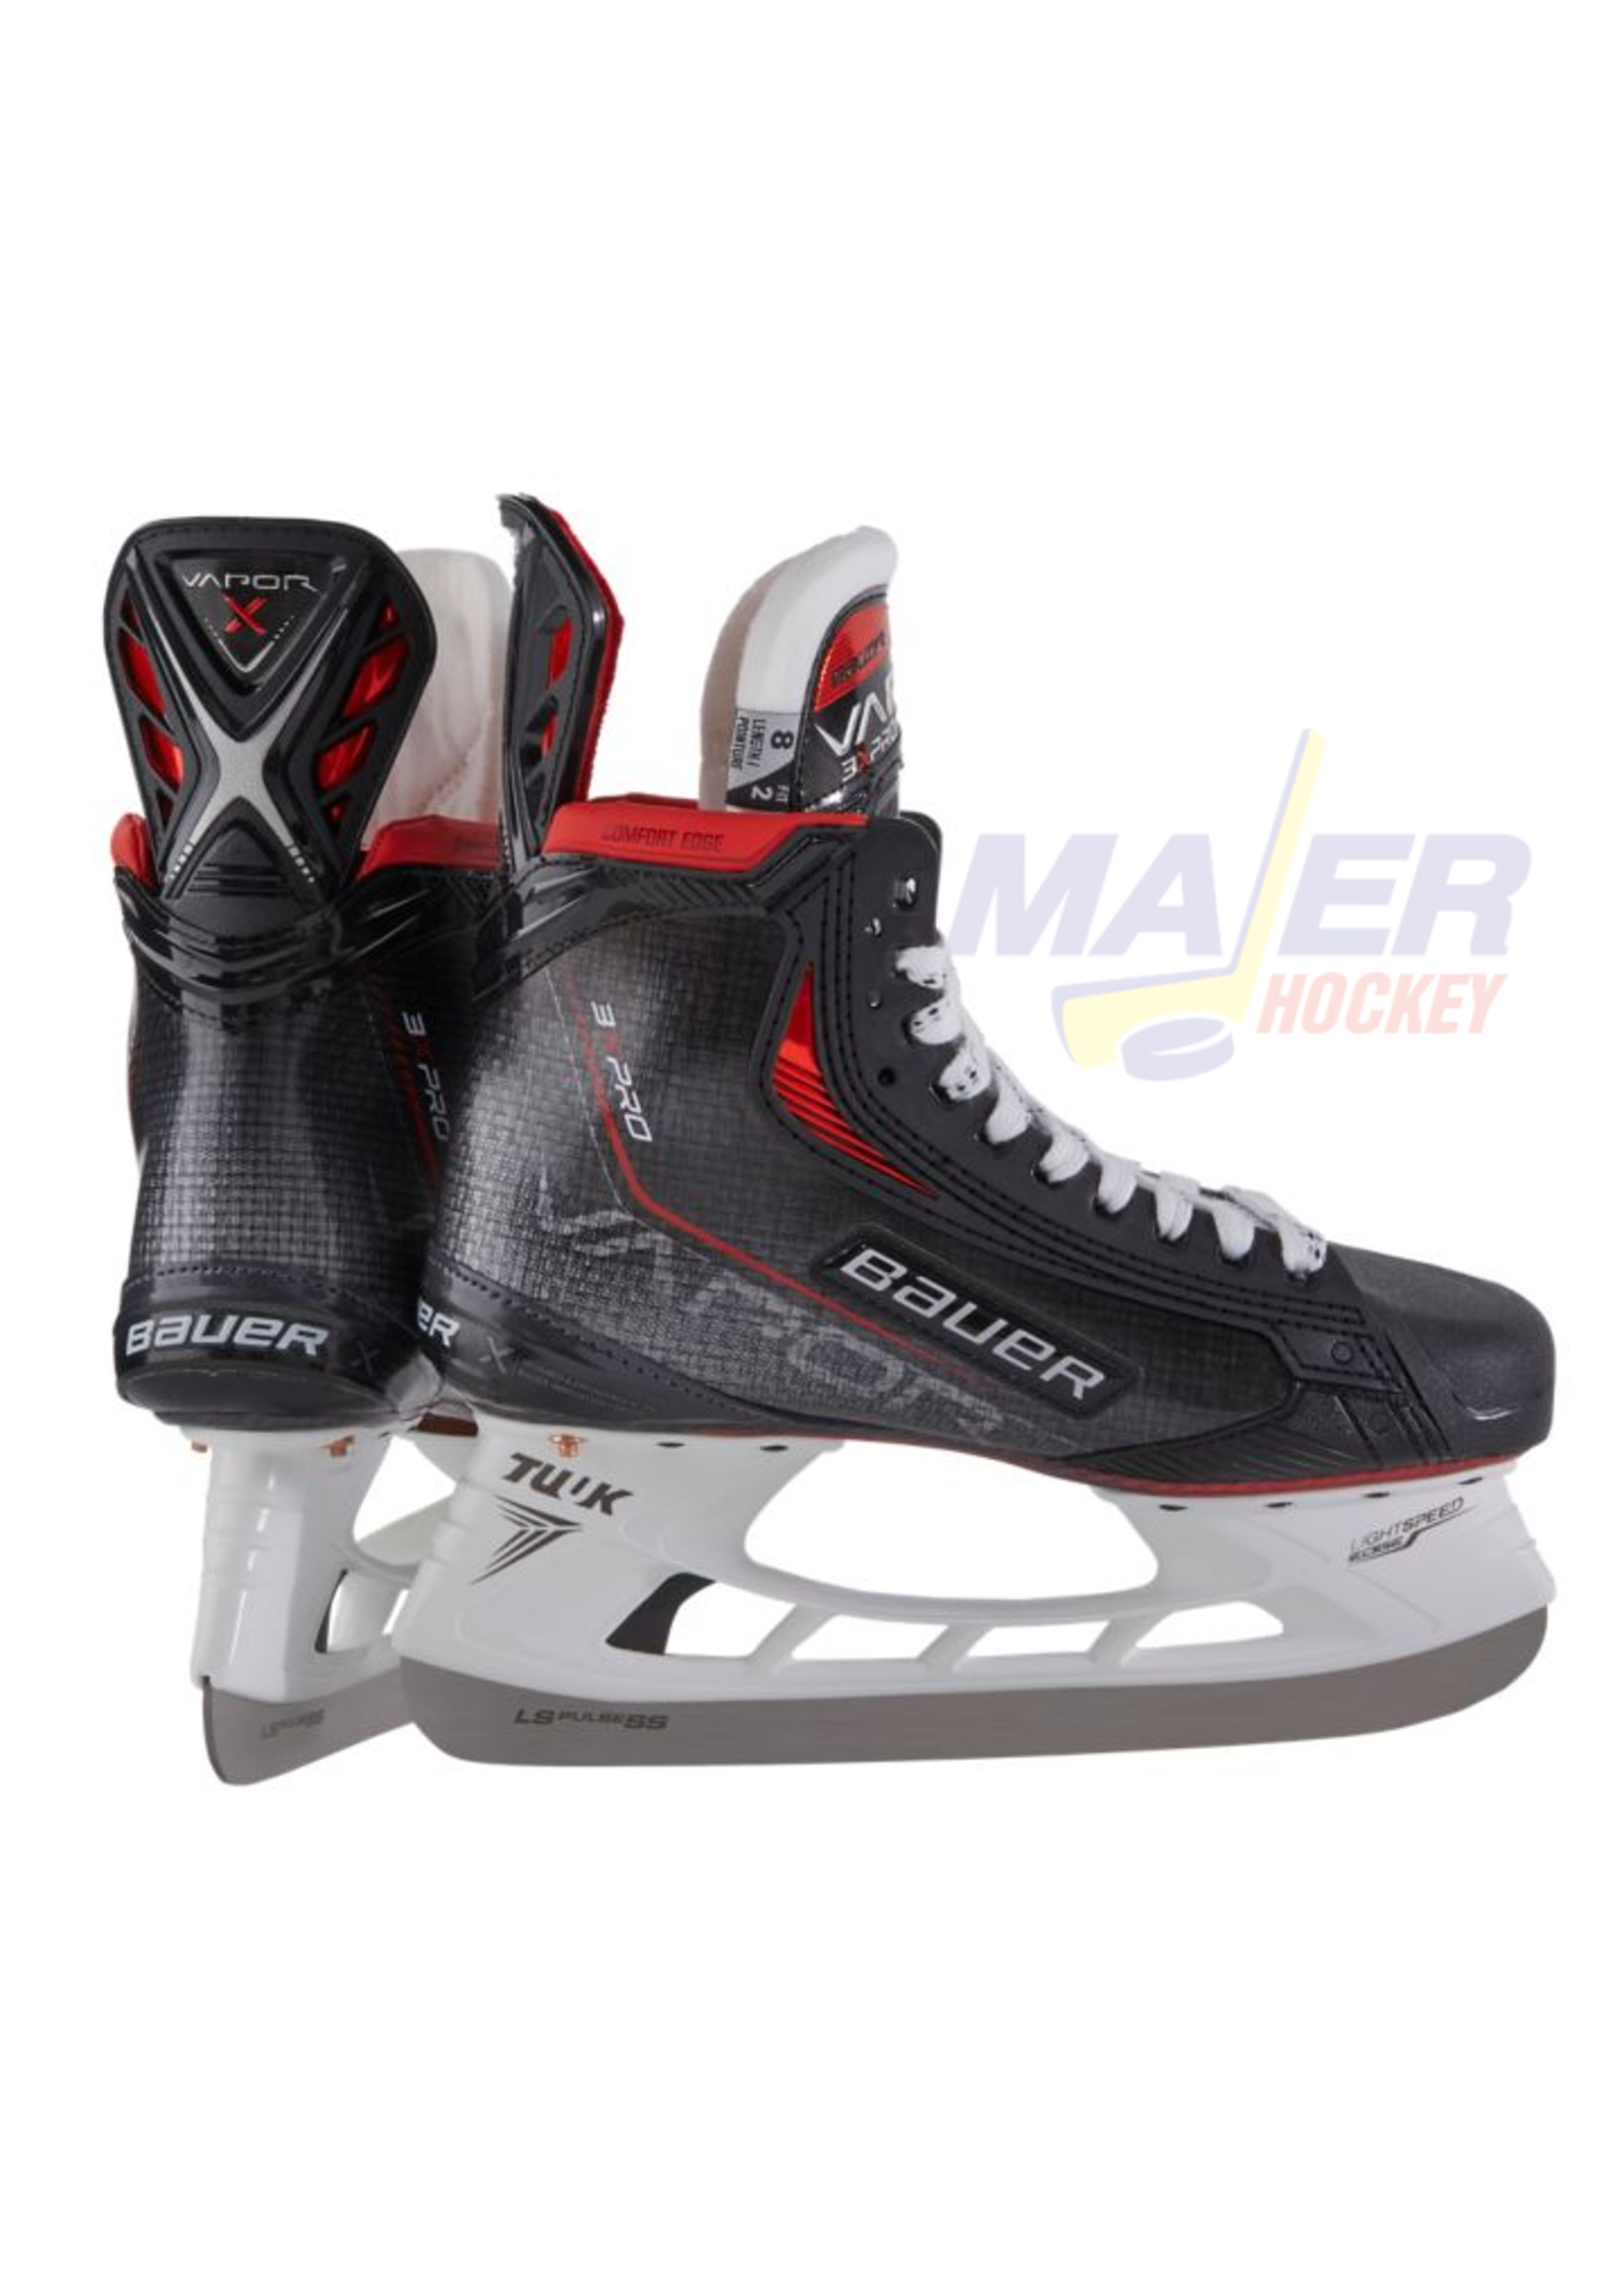 Bauer Vapor 3X Pro Int skates